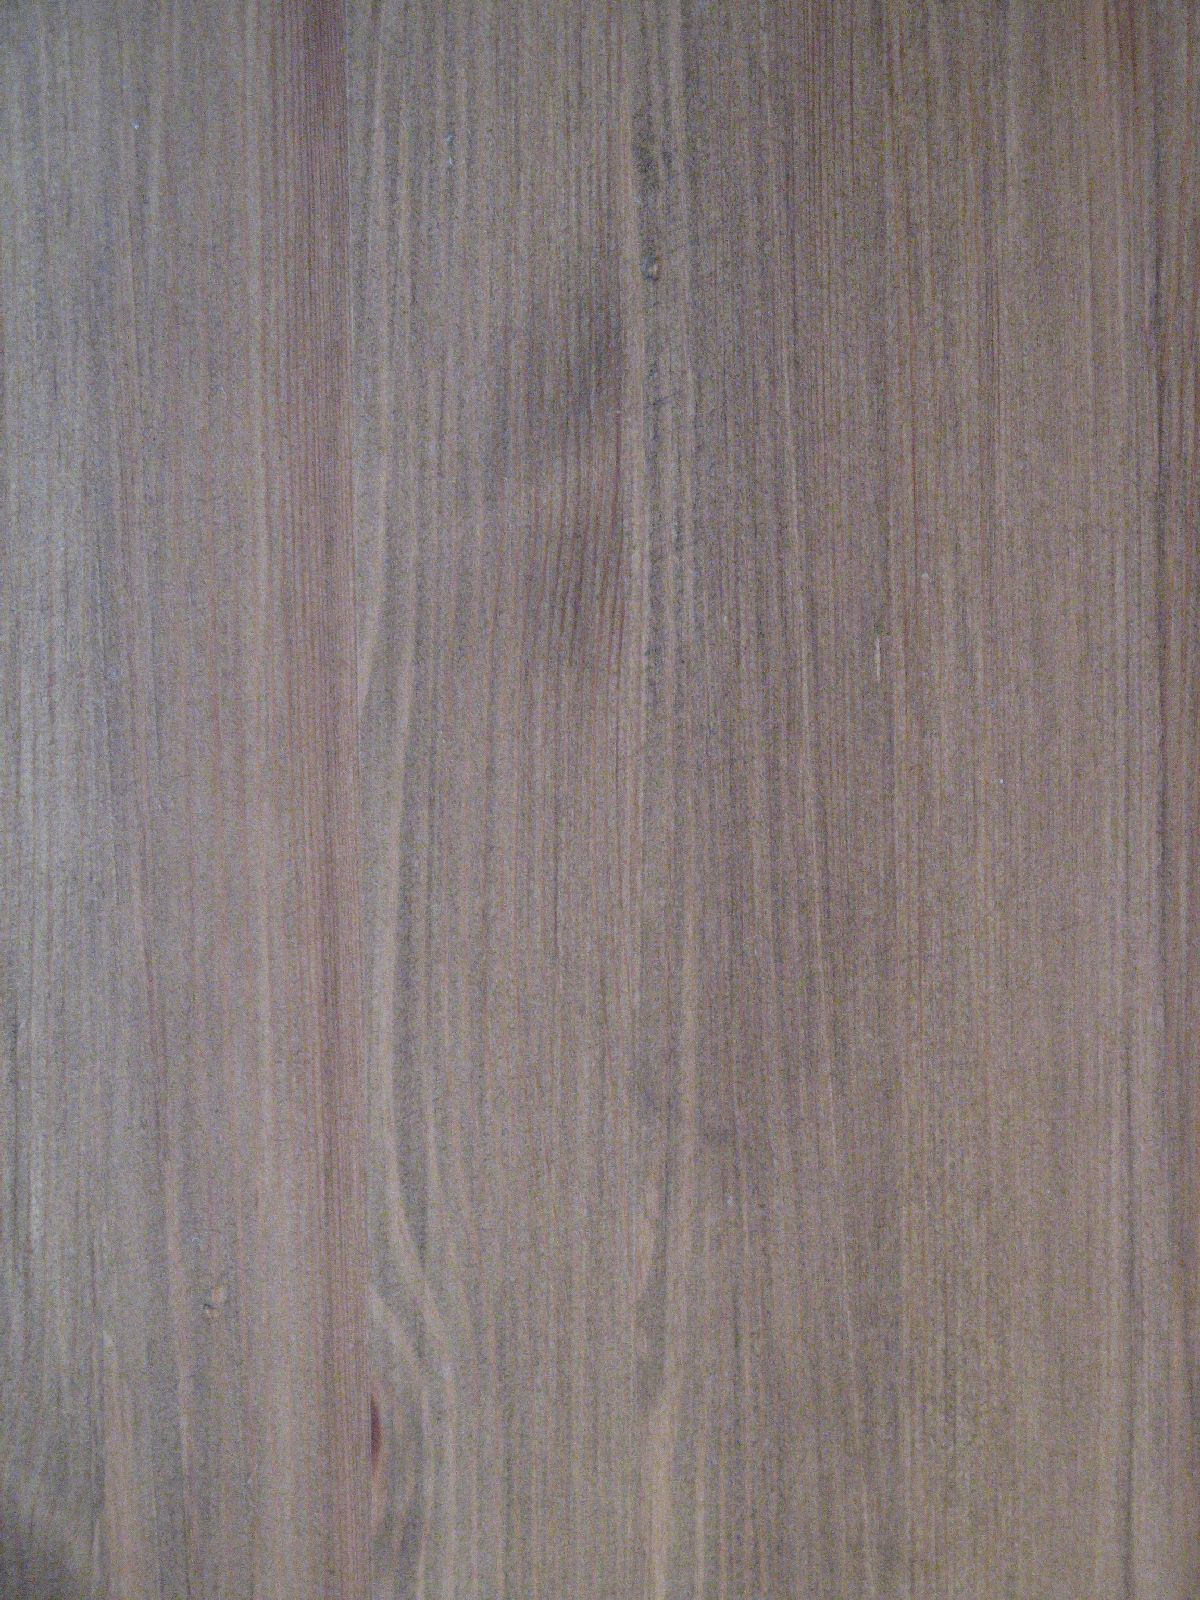 Wood_Textures_B_03929